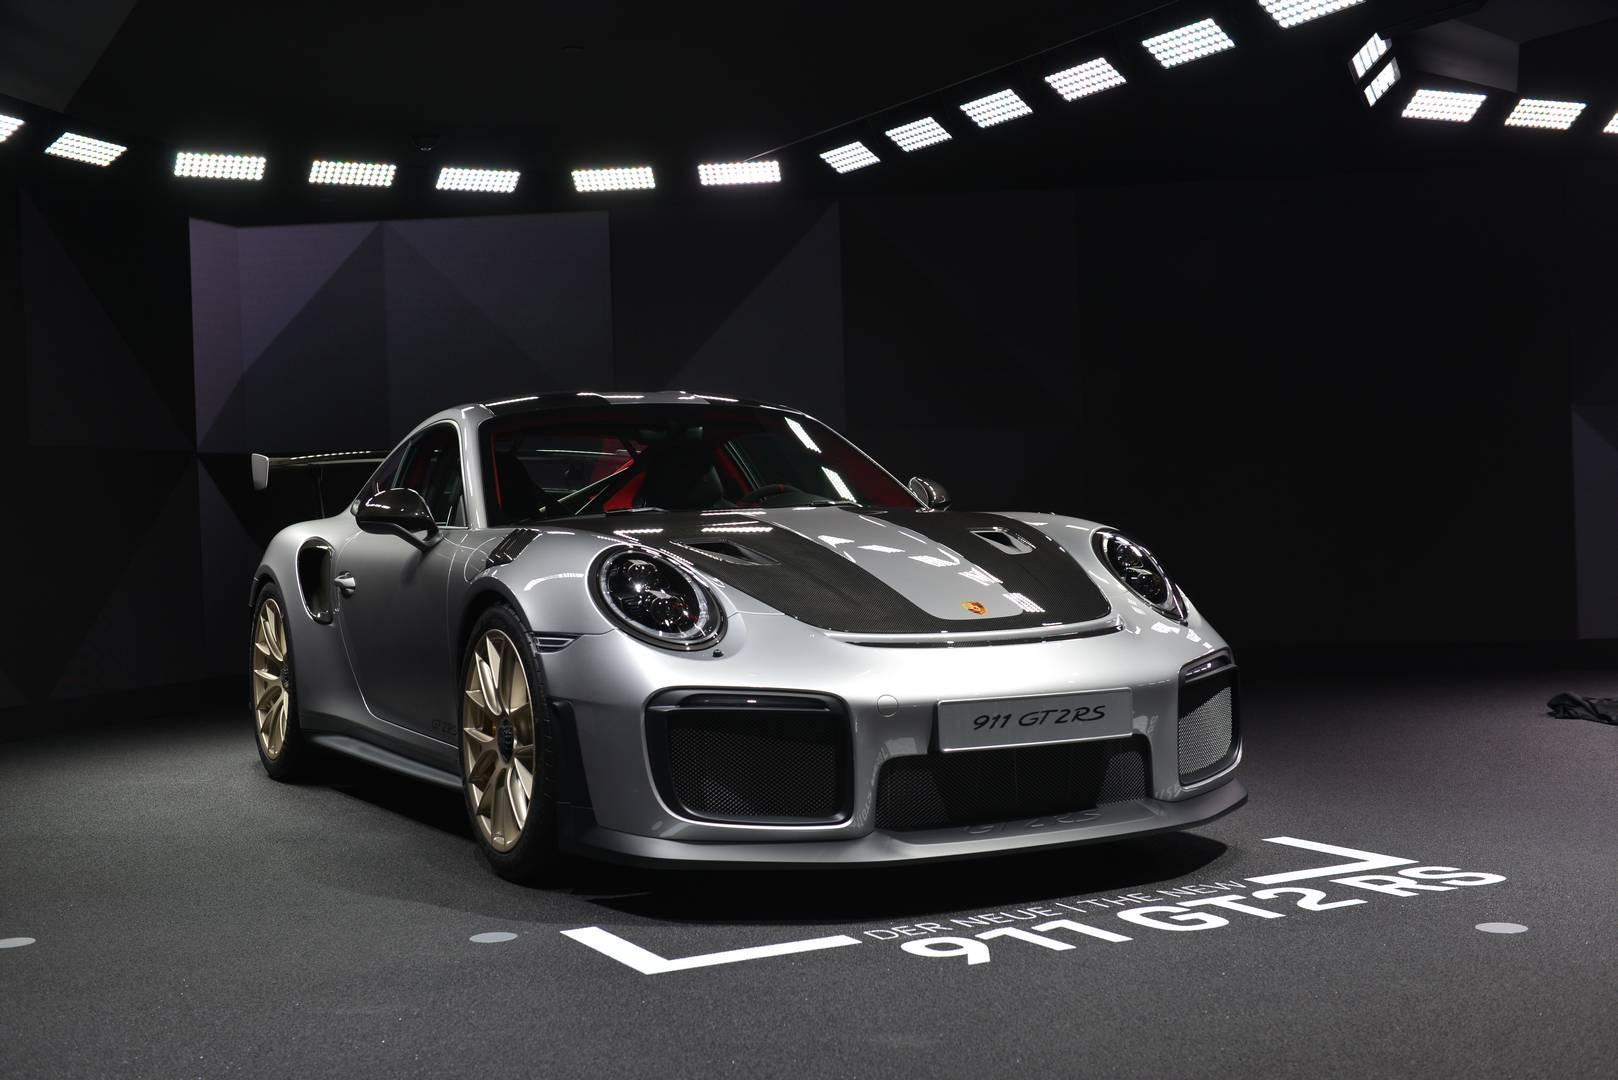 2018 porsche 911 gt2 rs eyes nurburgring record in fresh tests rh gtspirit com